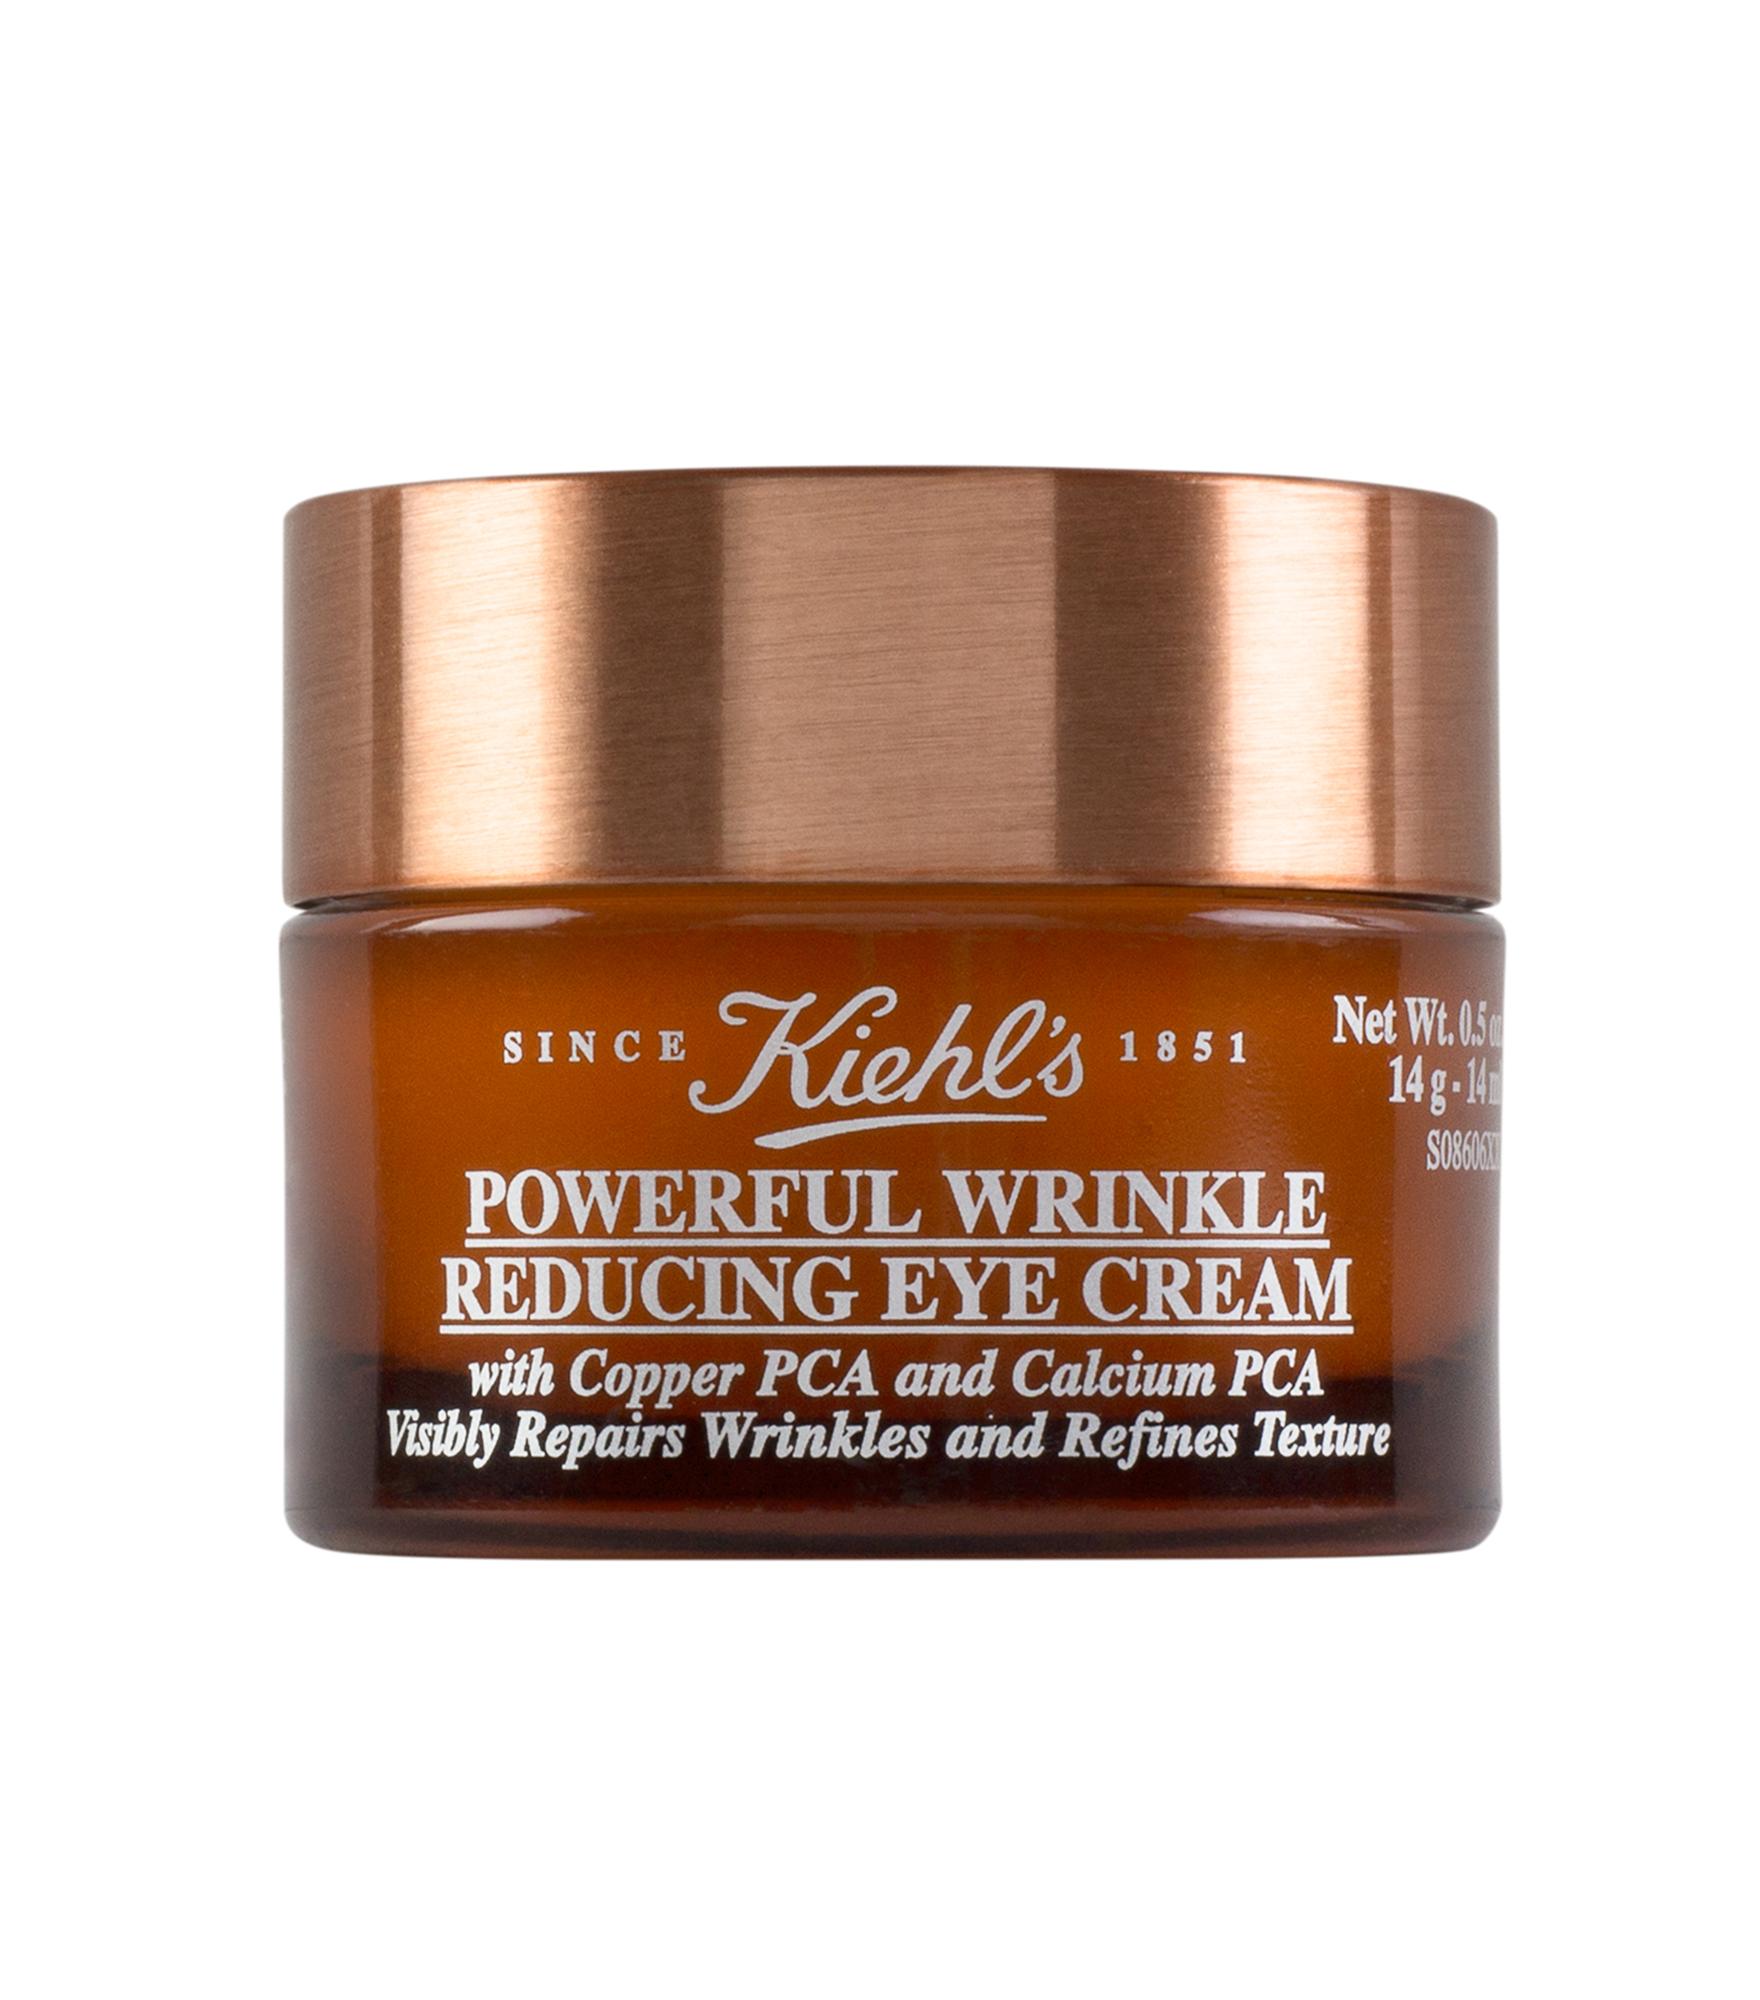 كريم العيون Kiehl's Powerful Wrinkle Reducing Eye Cream